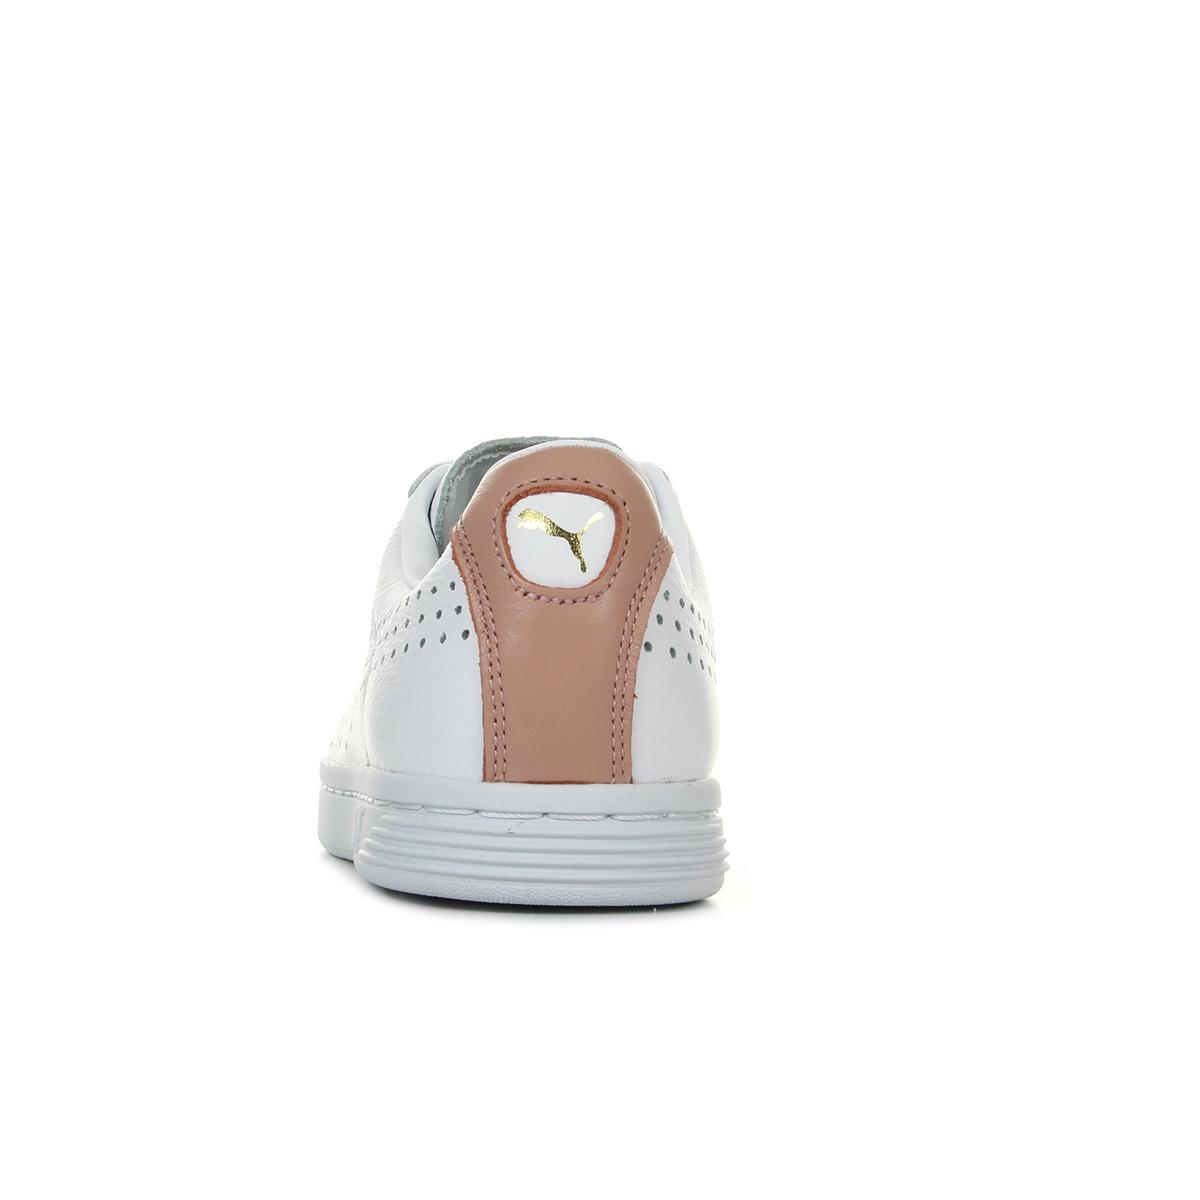 Puma Court Star NM Wn's 35788317, Baskets mode femme